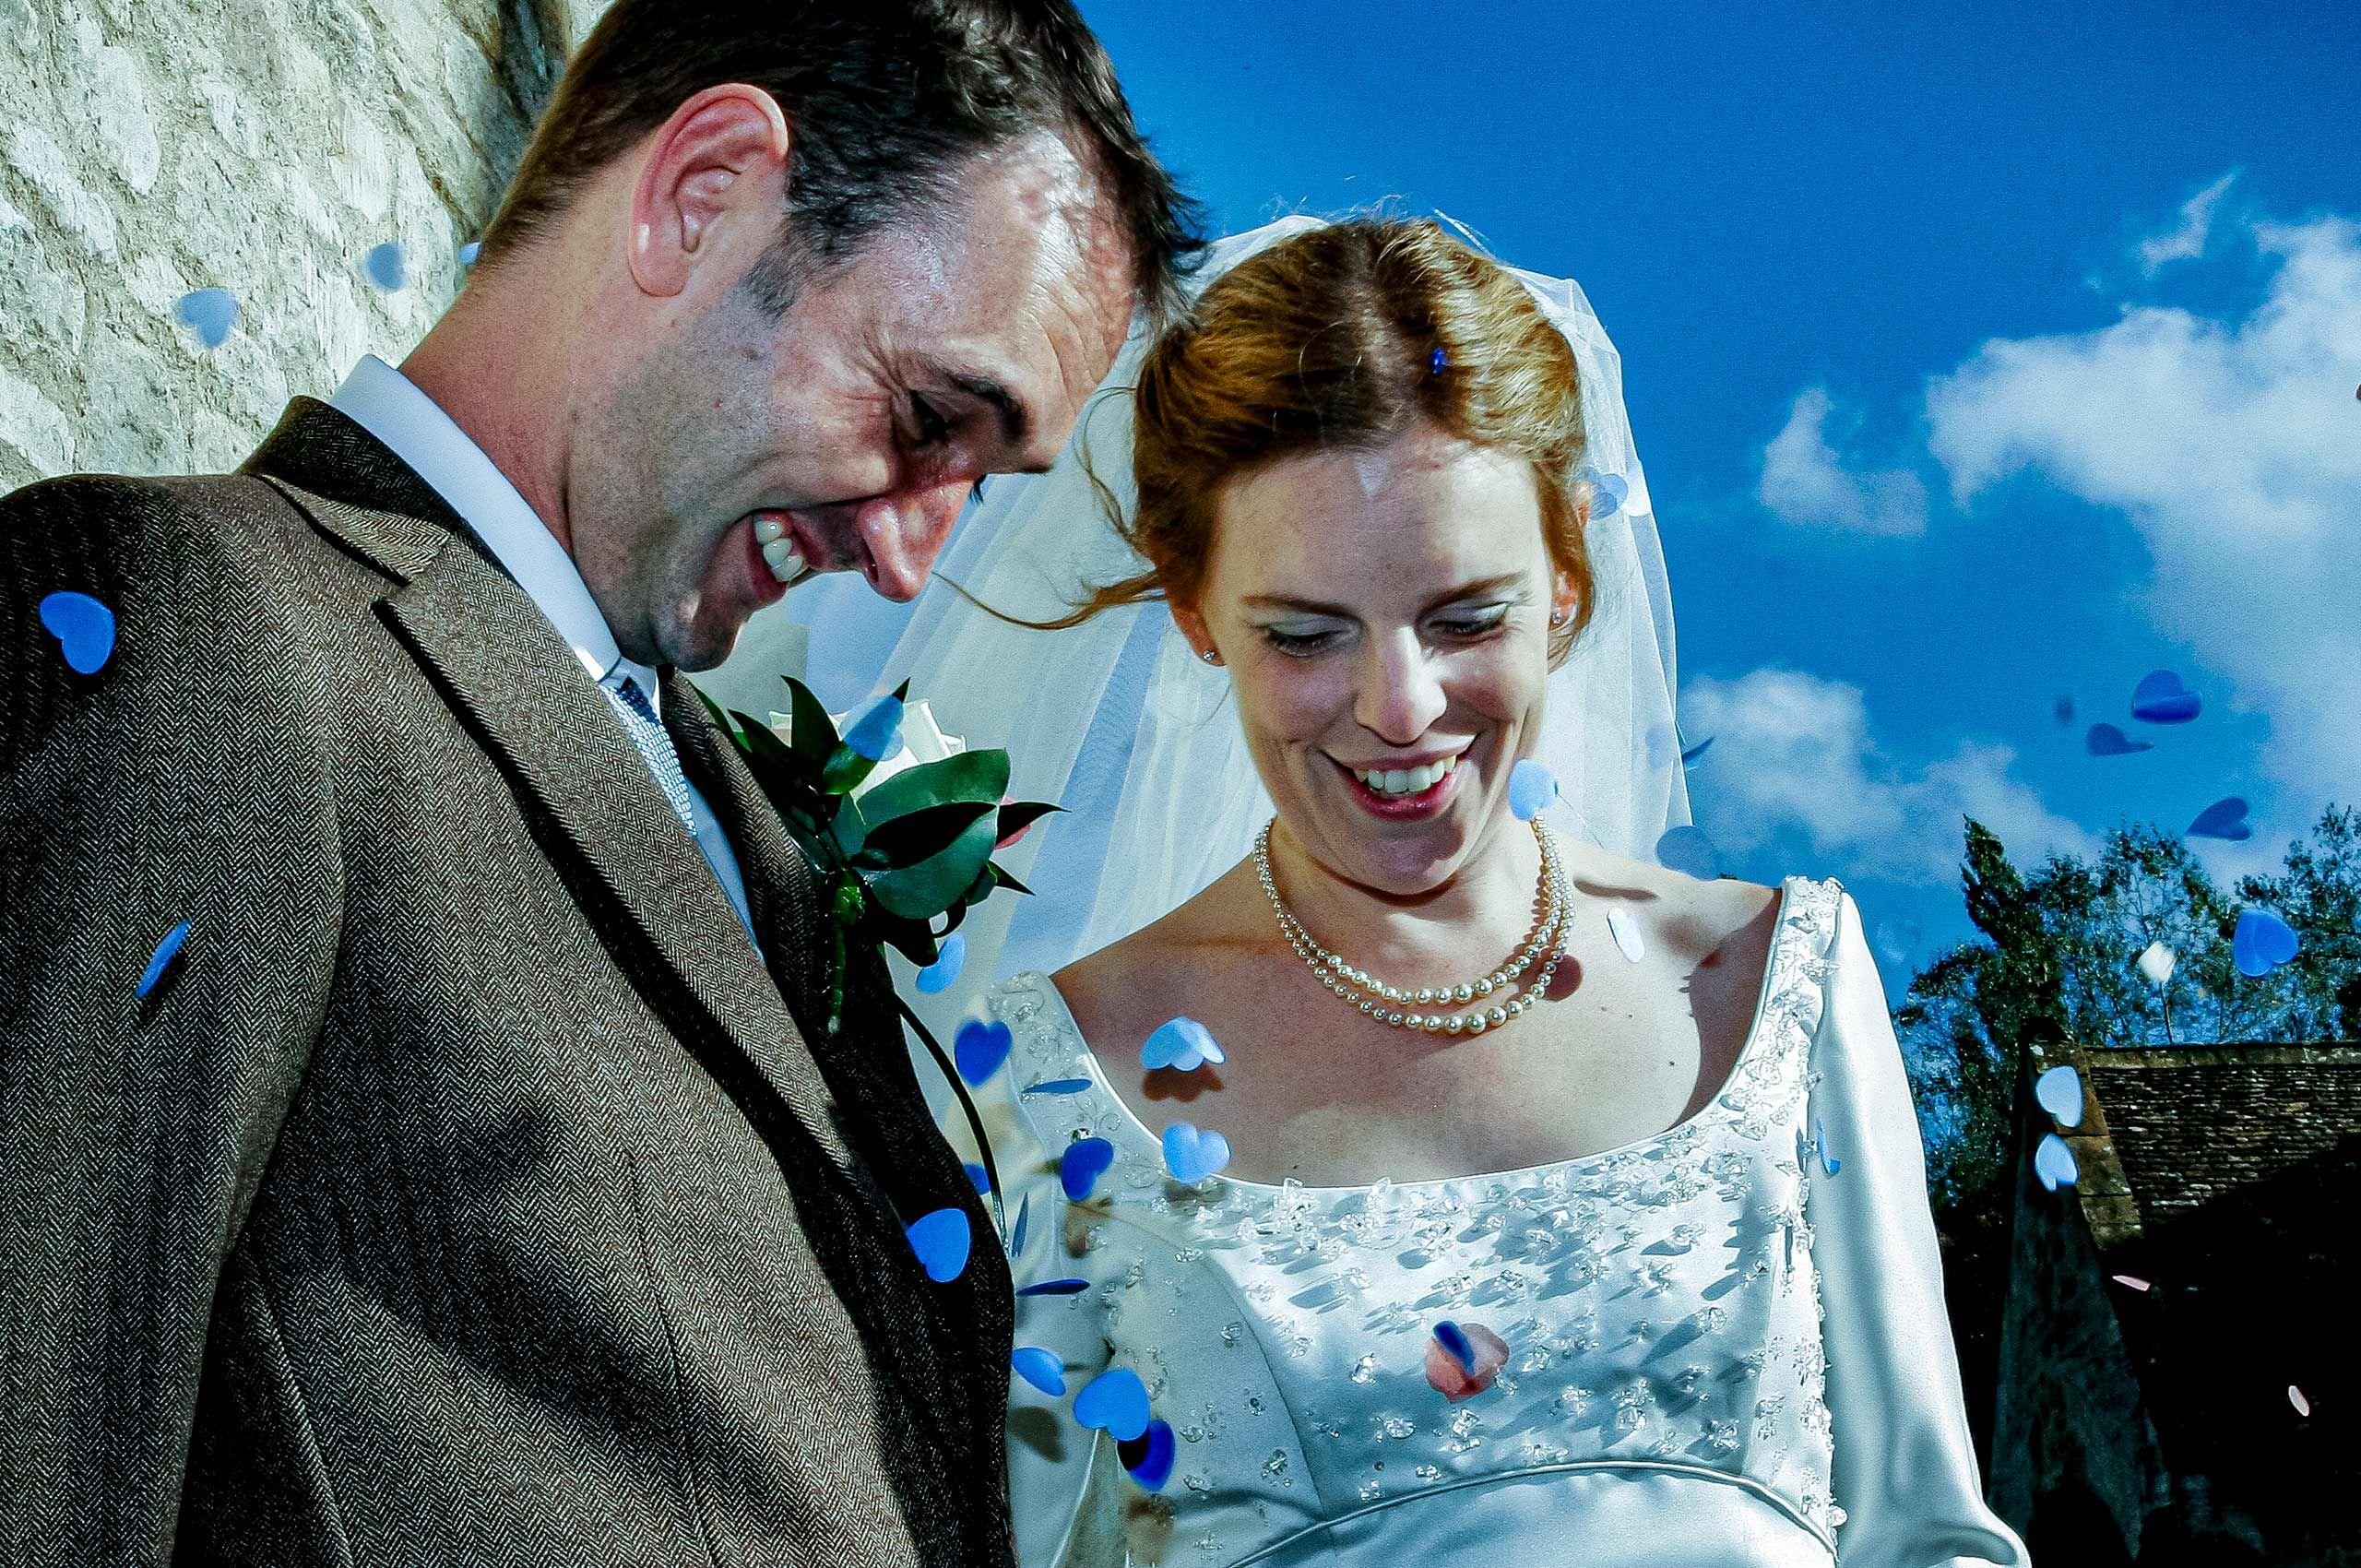 Dorset-Wedding-Photographer_Paul-Hames.jpg